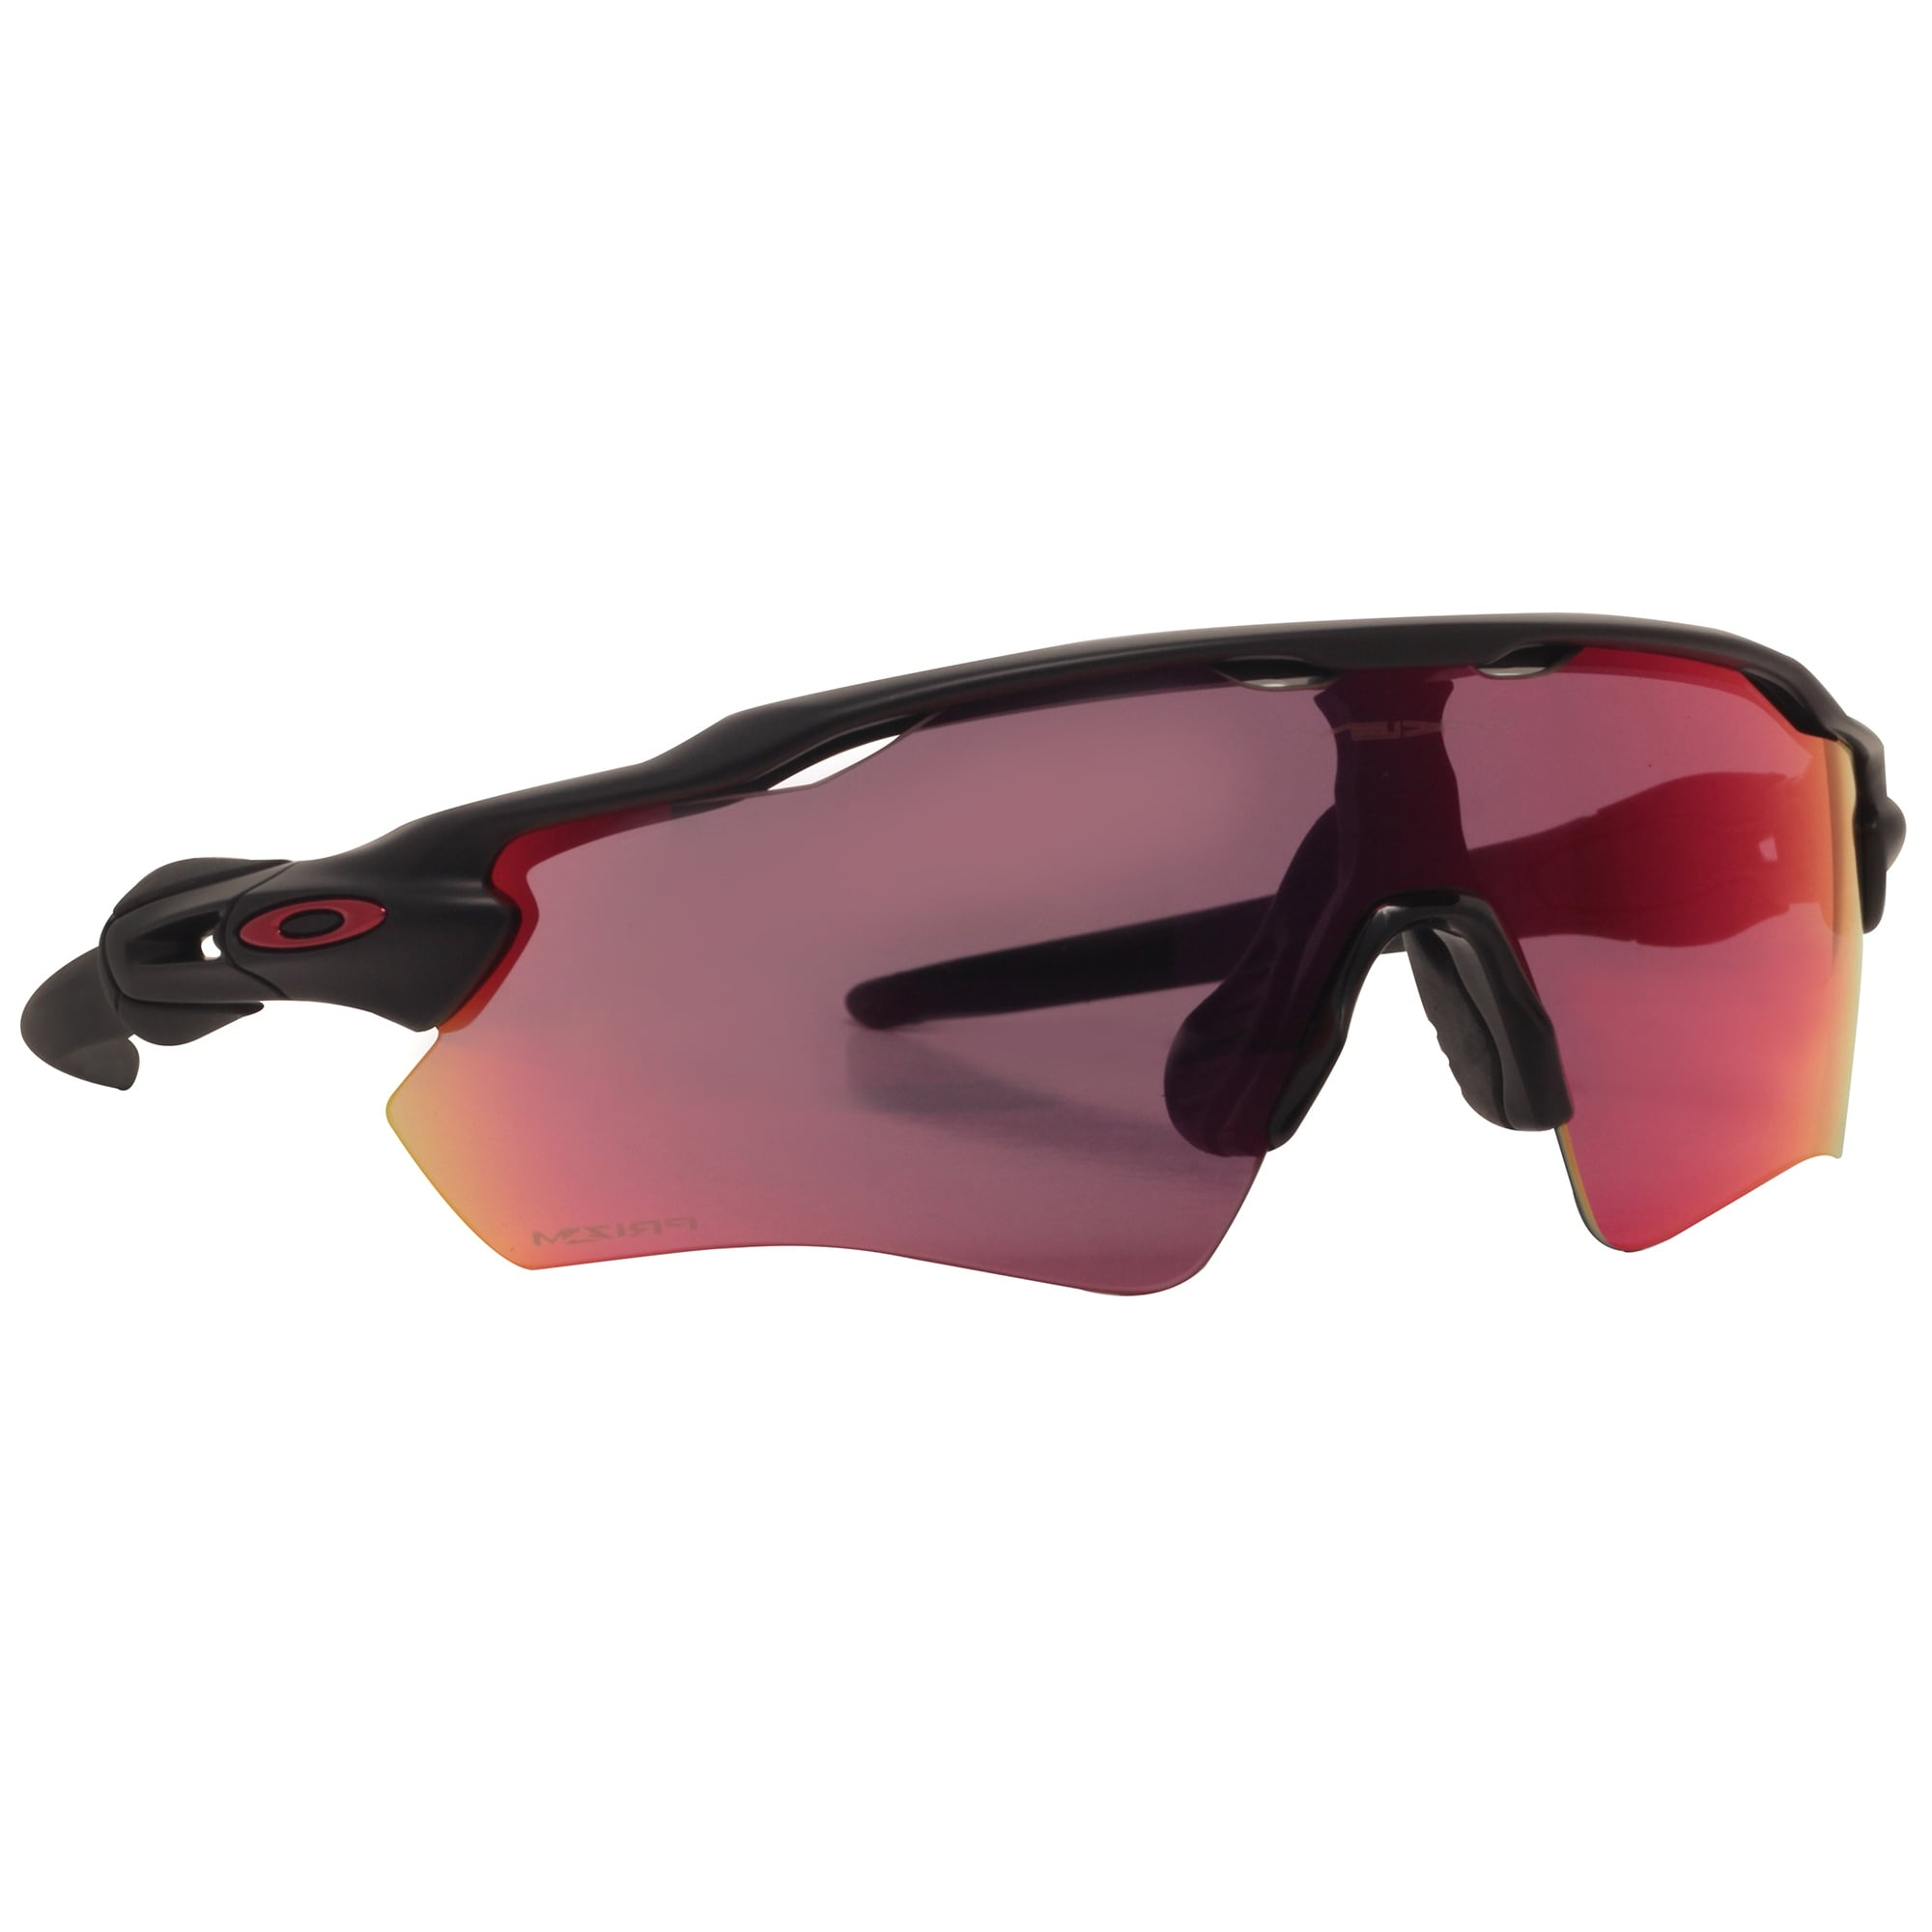 802be55c5fe3b ... spain shop oakley radar ev path oo9208 46 matte black prizm road mens  shield sunglasses matte